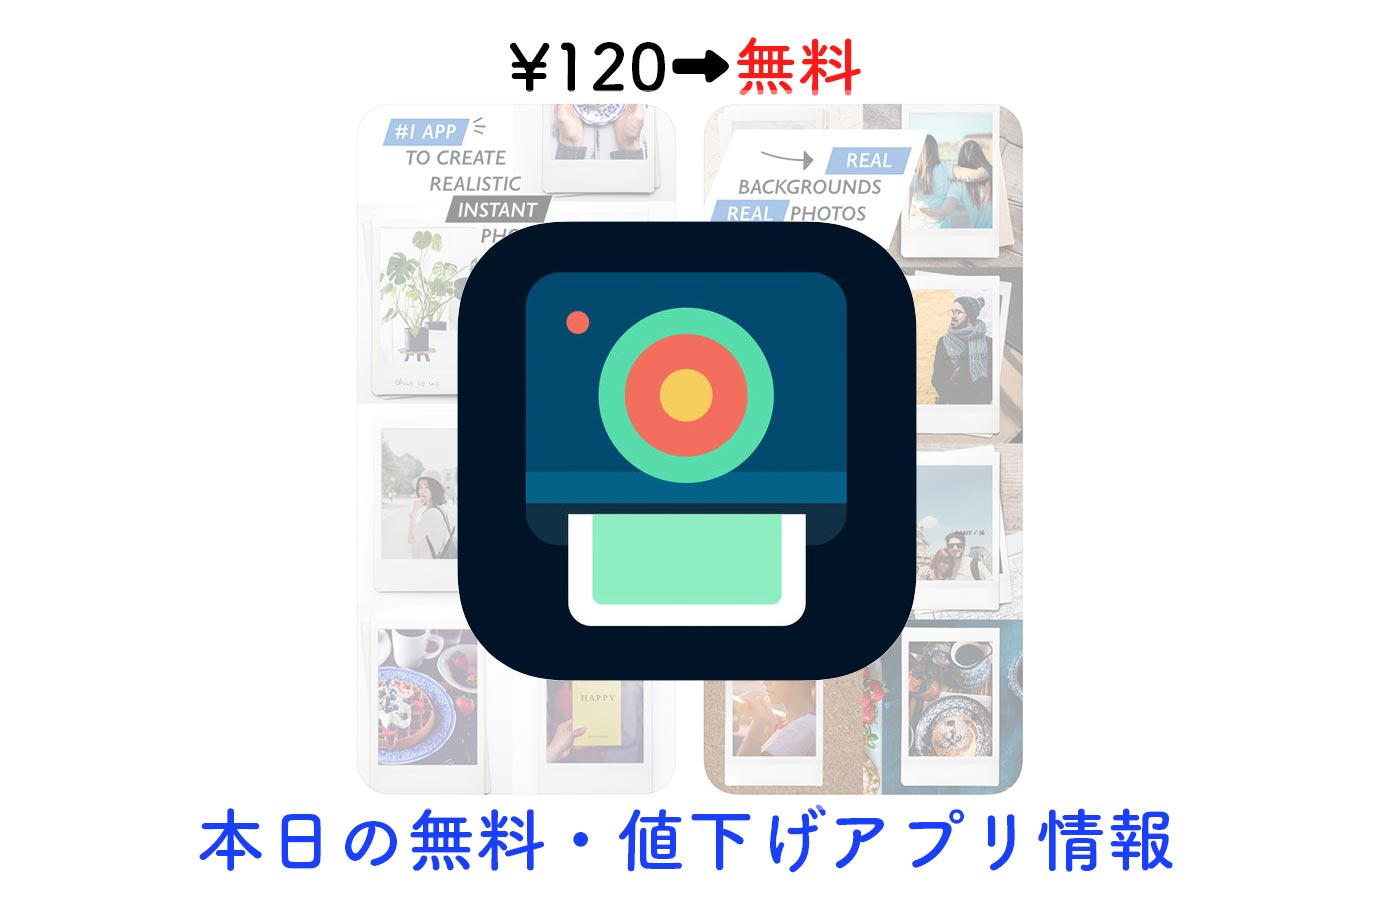 Appsale0518